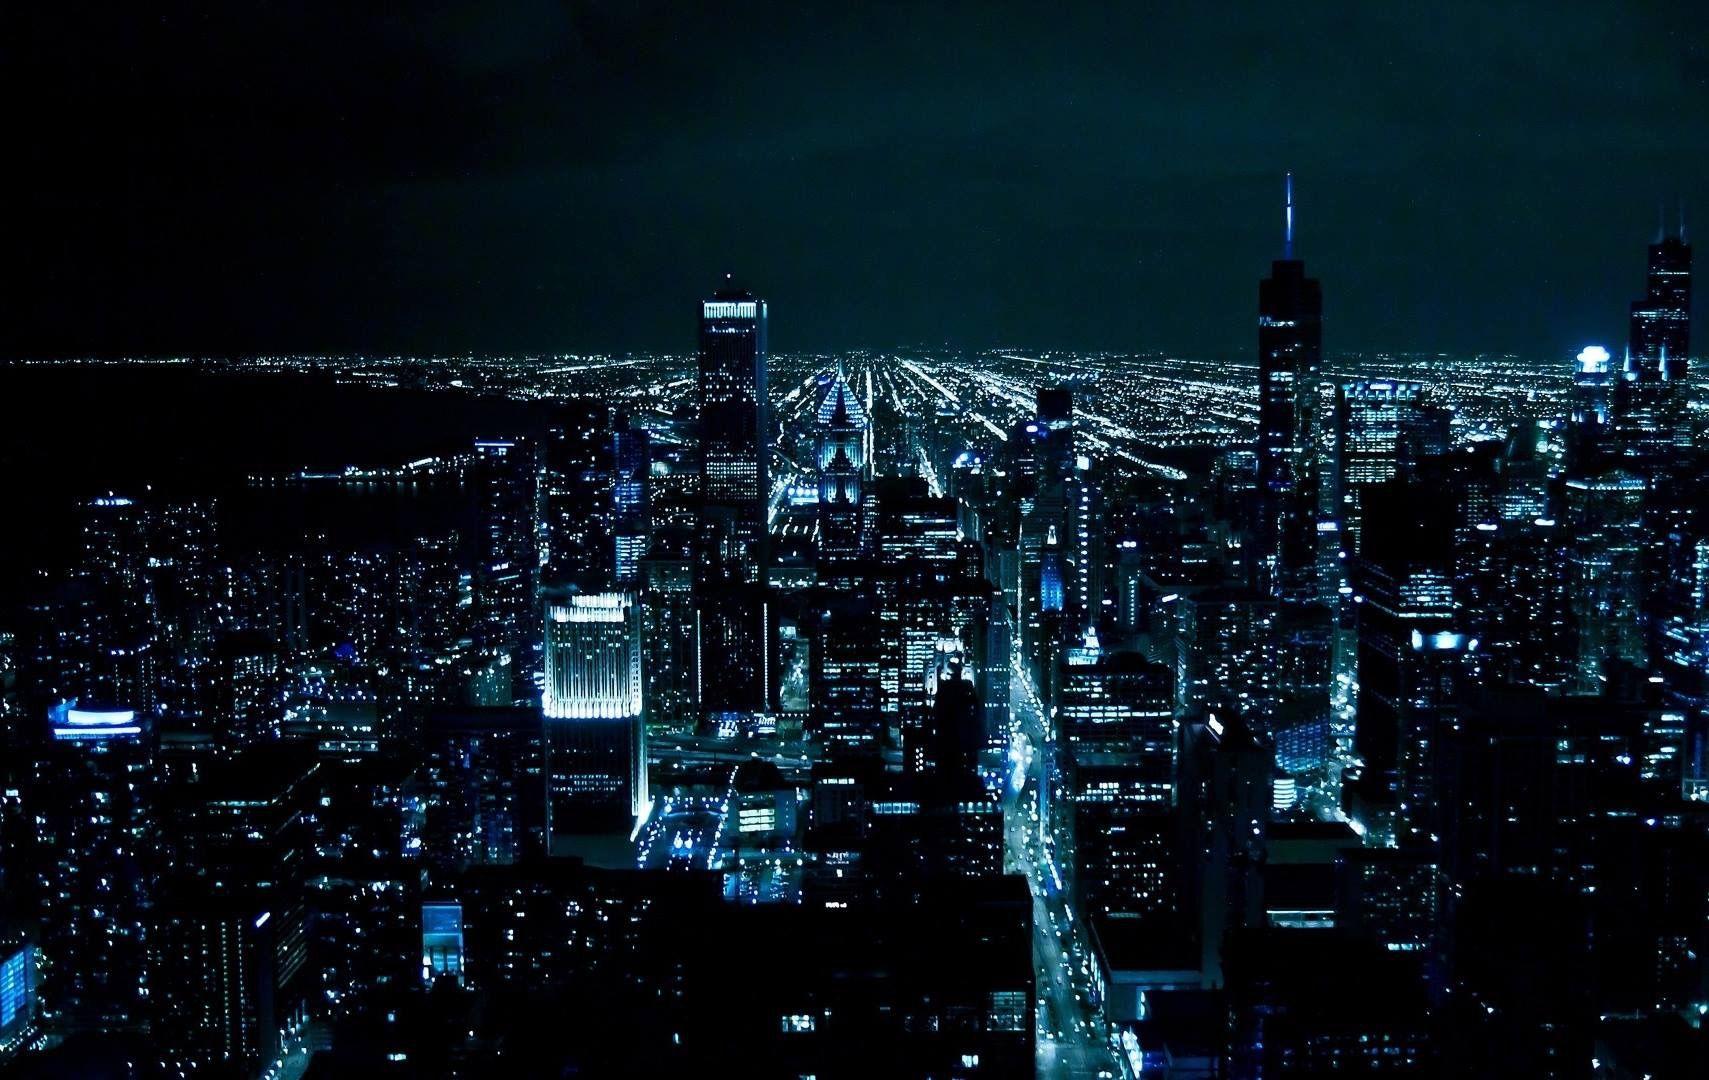 Pin By Sagar Patil On Chicago City Lights Wallpaper City Wallpaper Night City Wallpaper